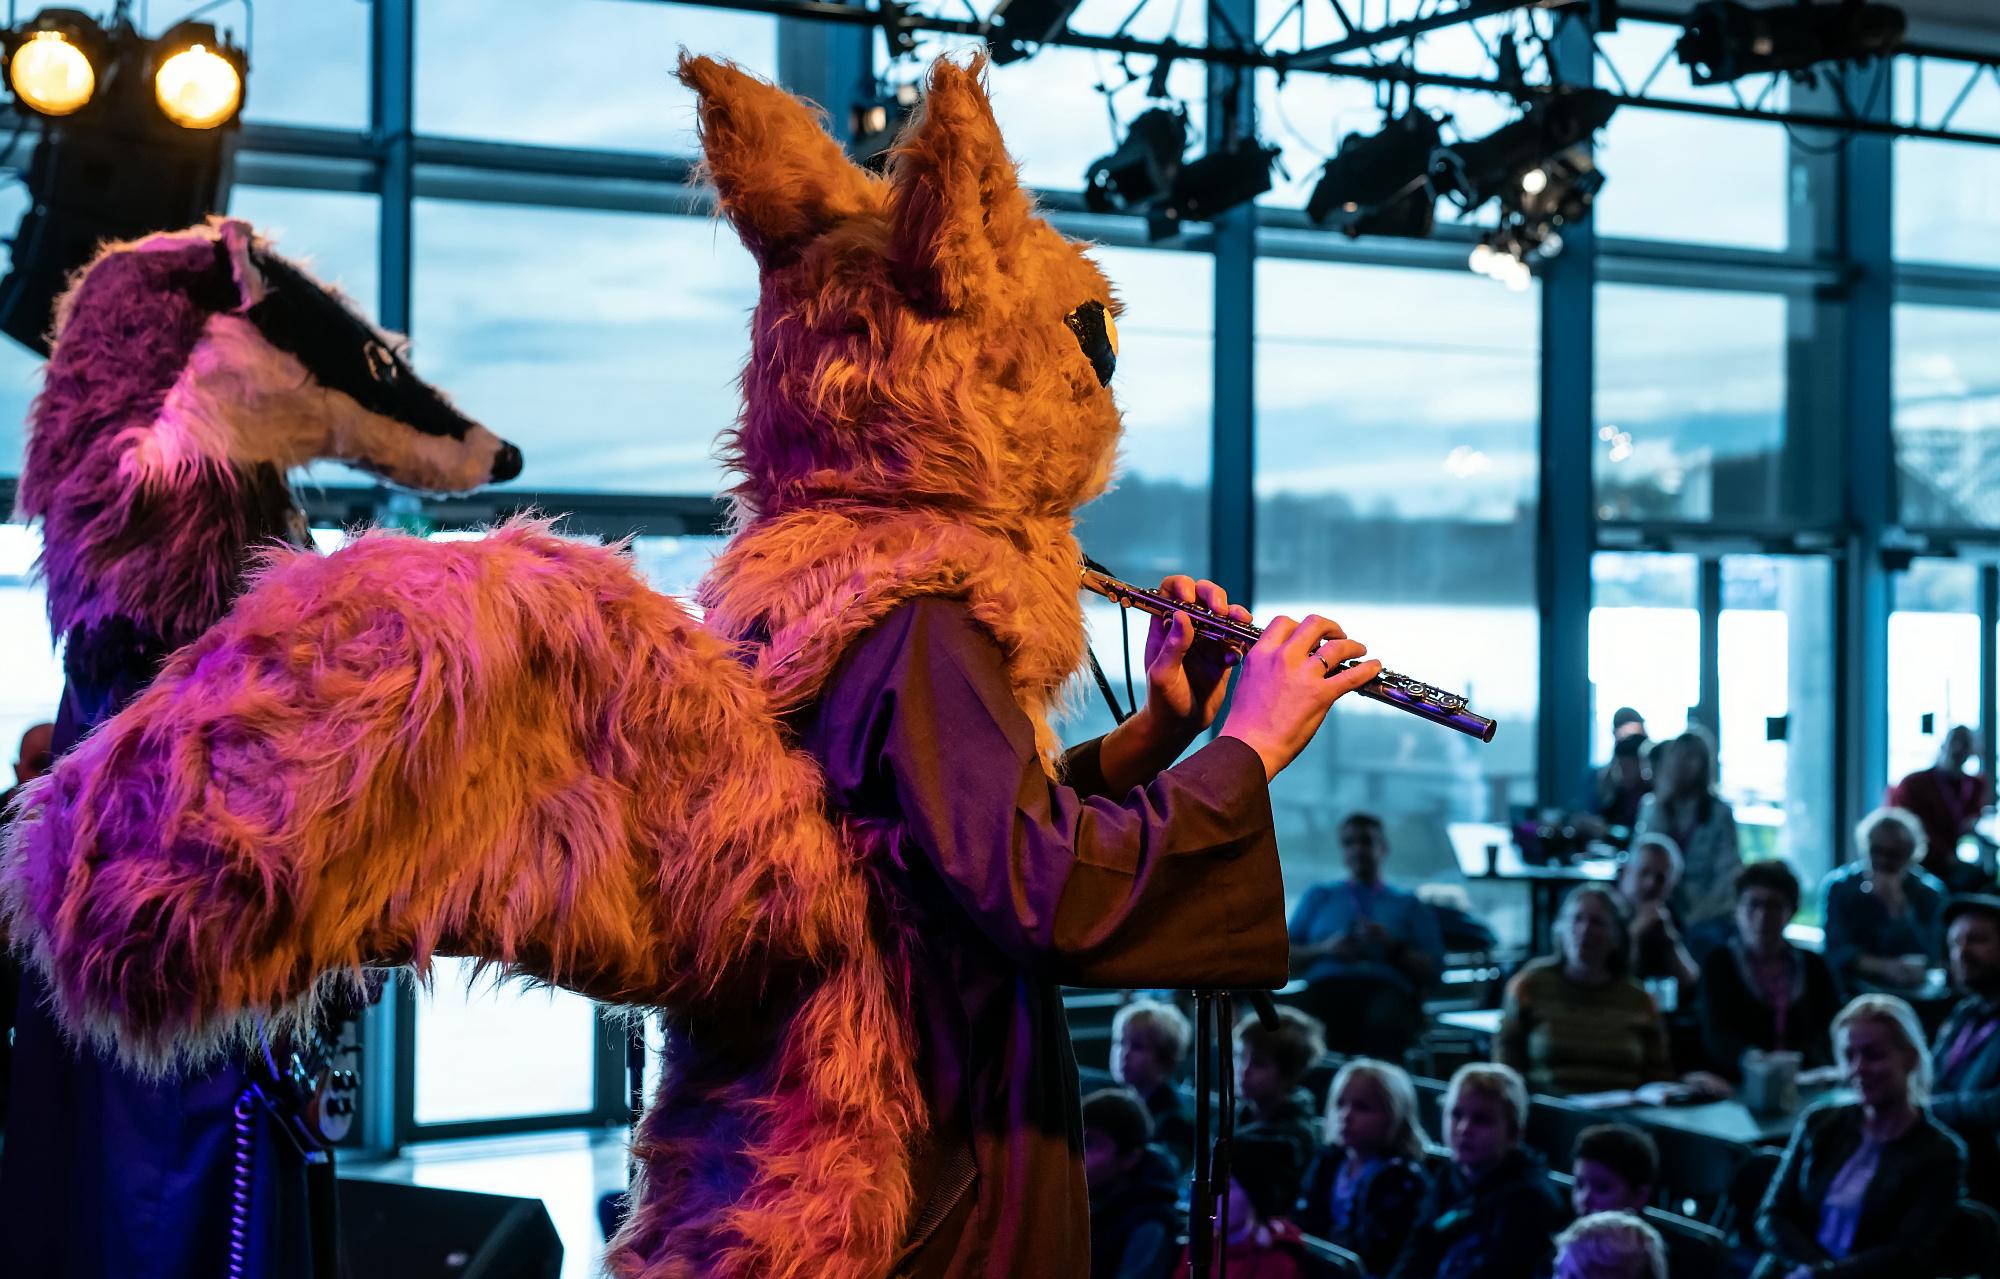 Grevling og ekorn fra bandet Tusmørke - bydyra begeistret mange med sin økoprogrock.